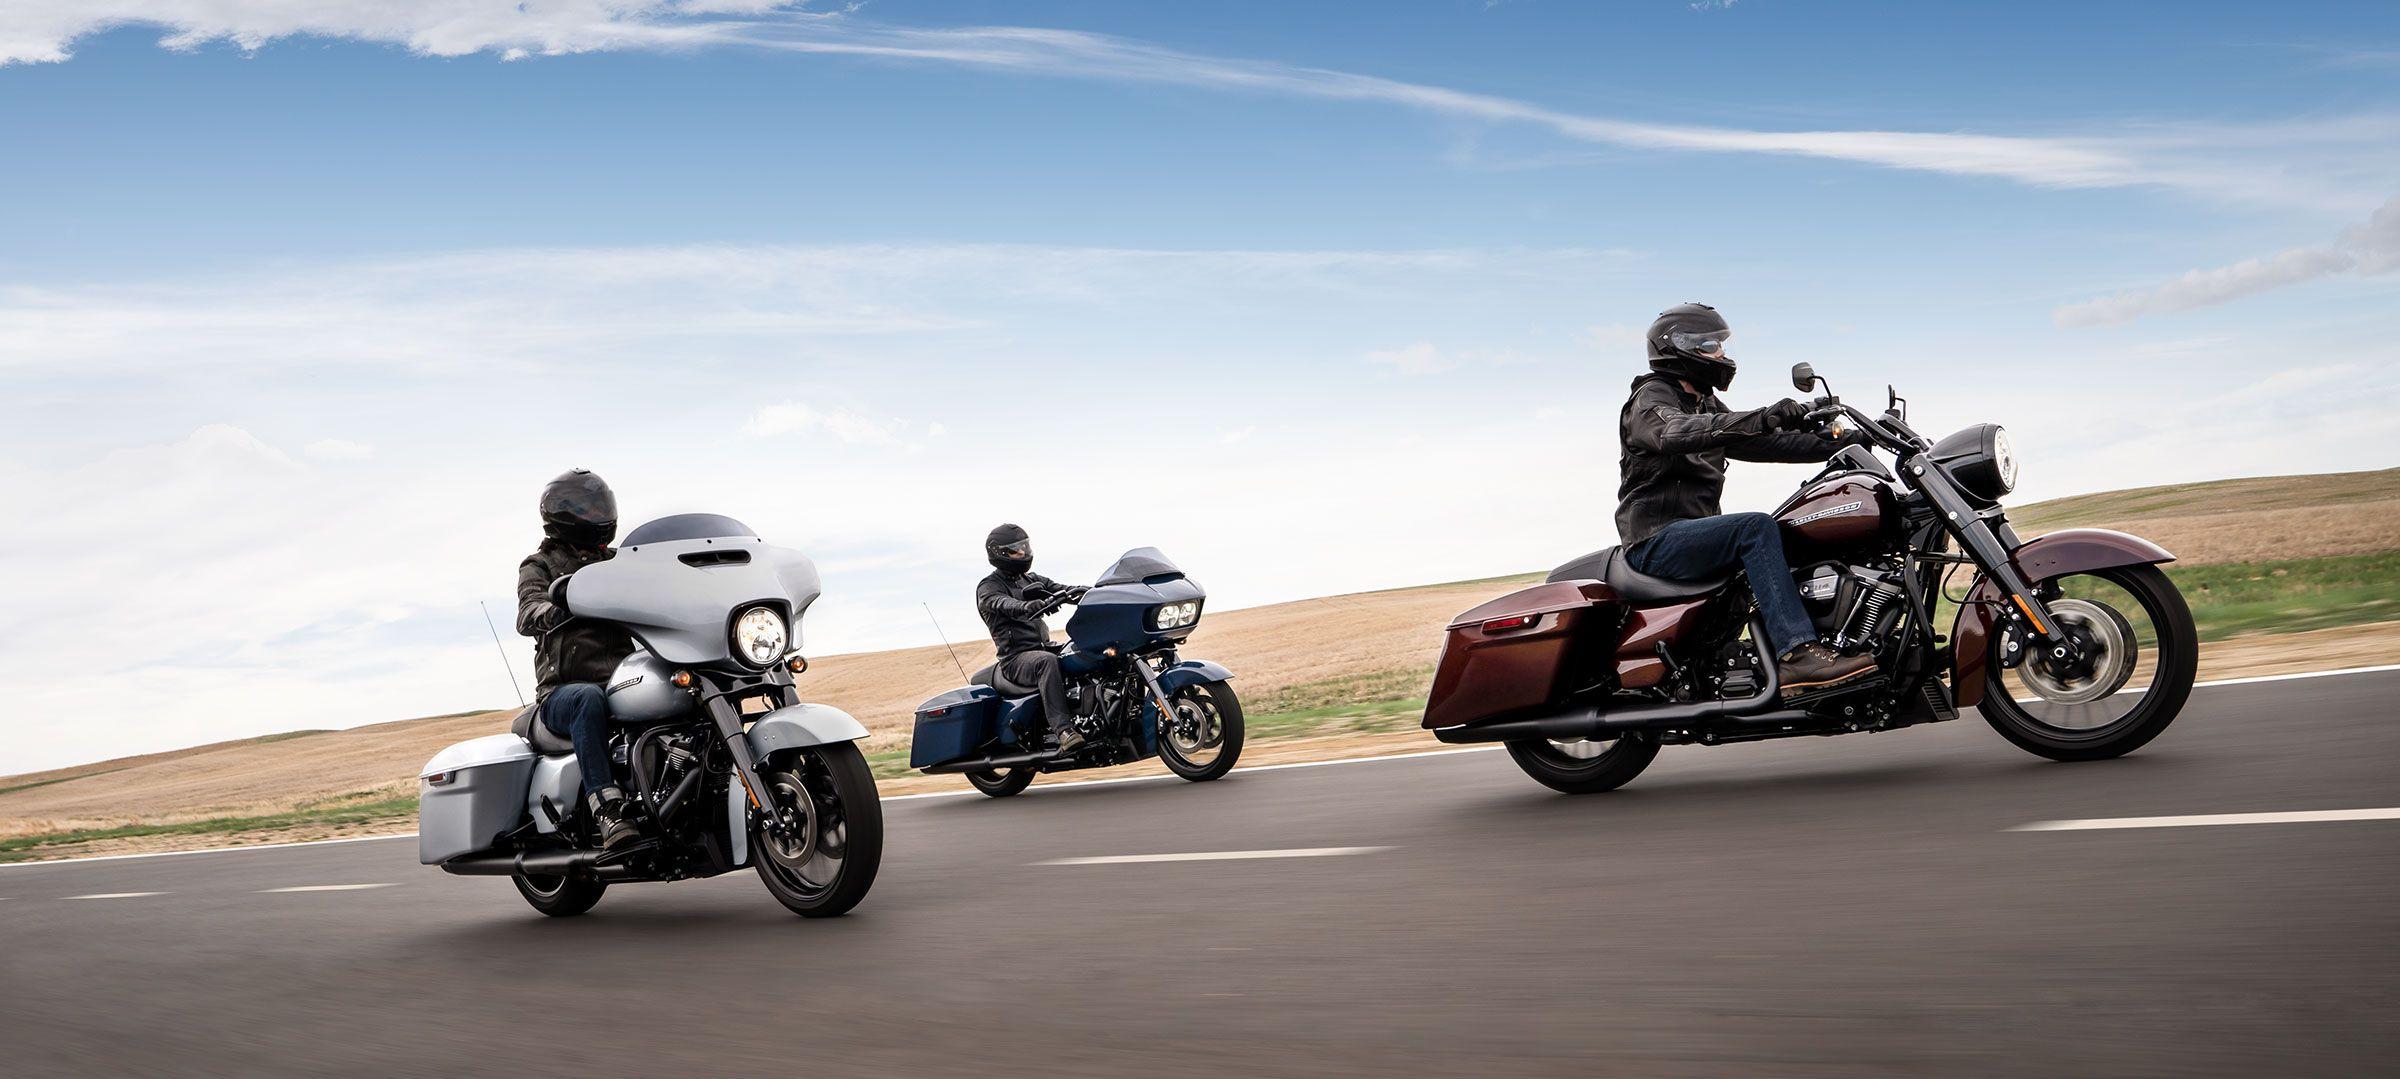 New & Used Motorcycle Dealer | Red River Harley-Davidson® - Texas Harley Davidson Dealers Map